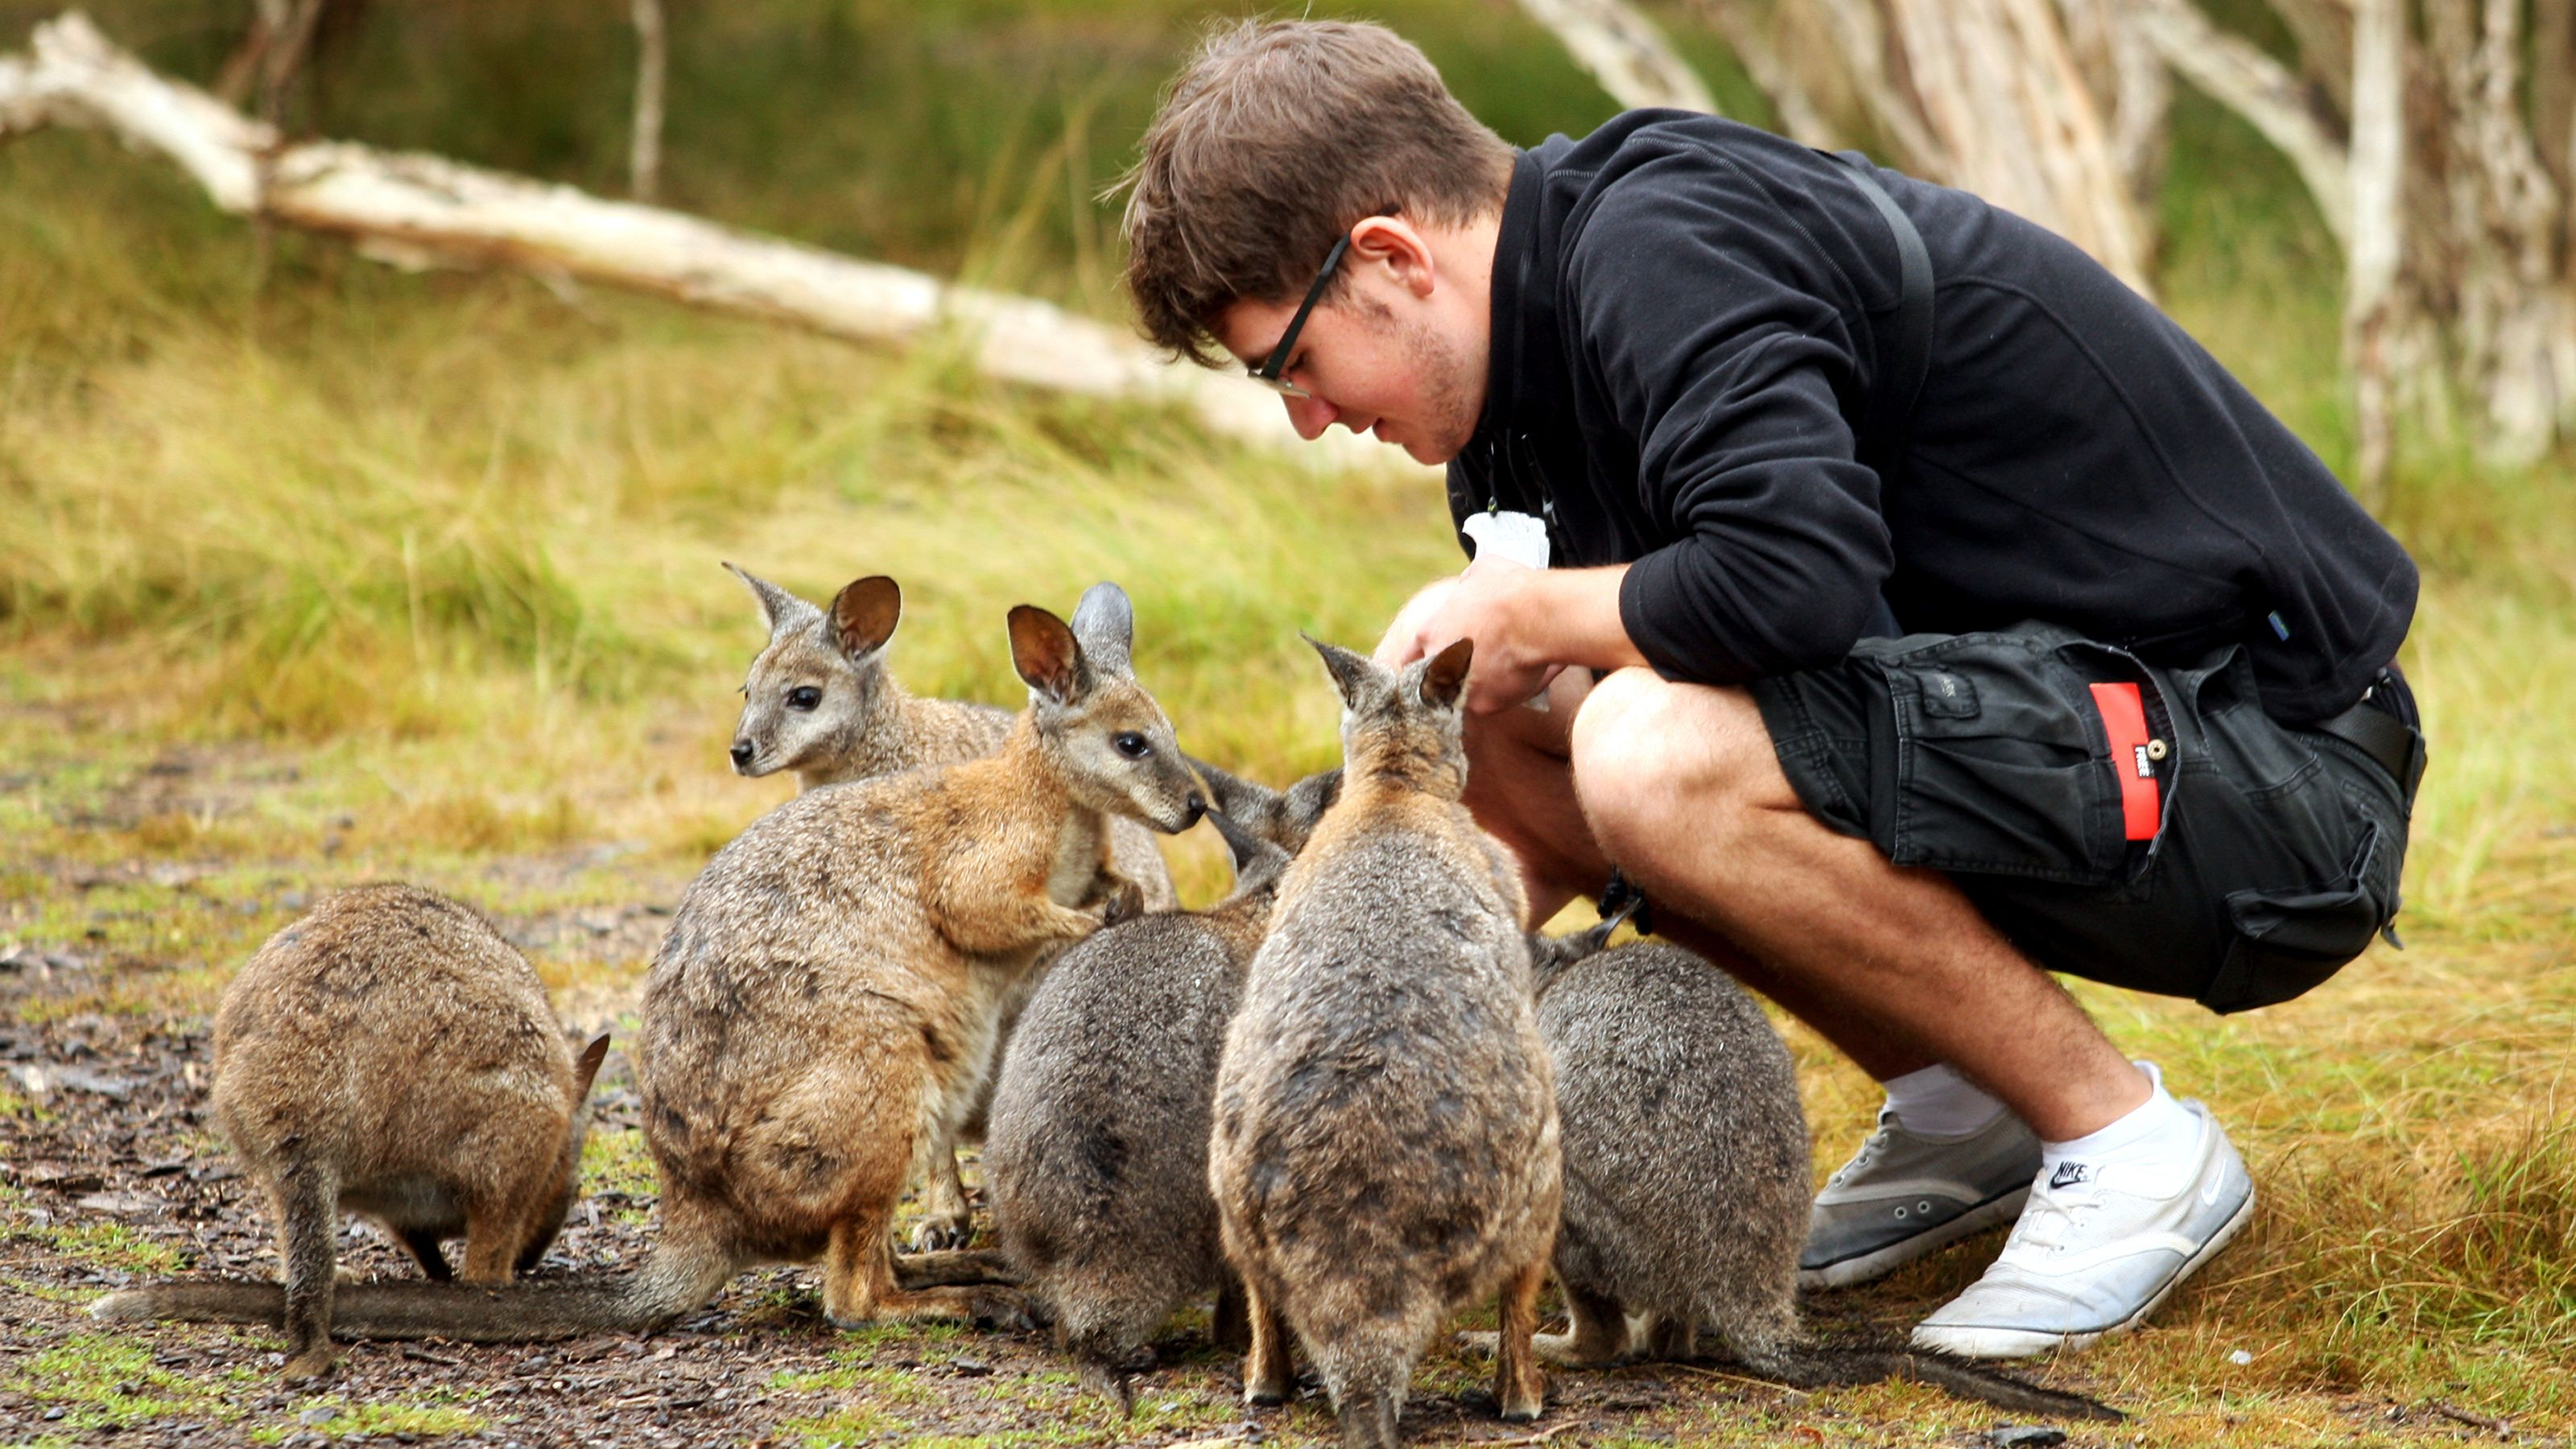 Man feeding group of baby wallabies